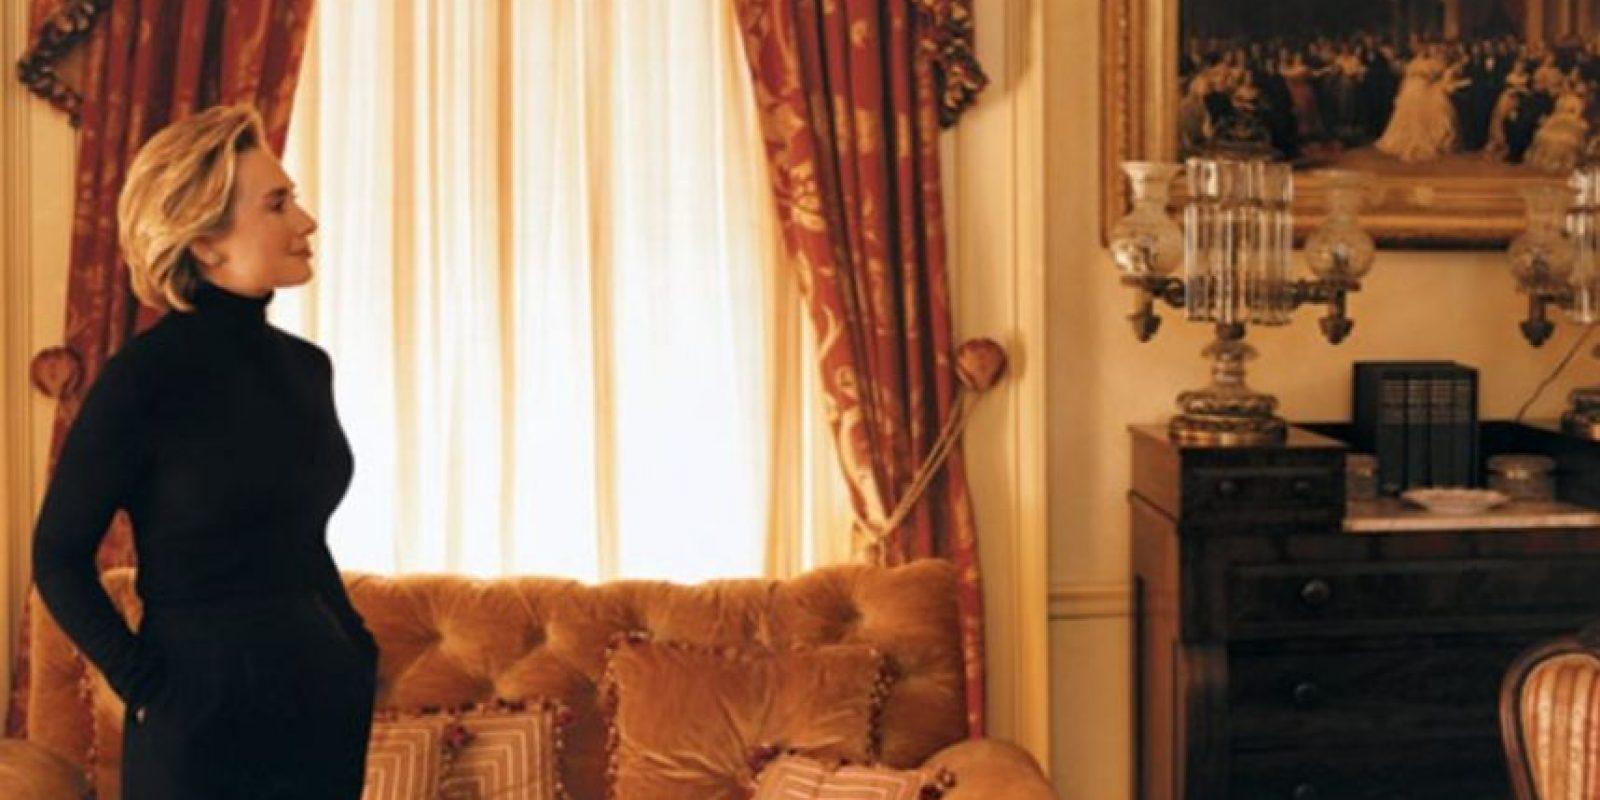 Marc Jacobs diseñó las camisetas de campaña de Hillary que usó gente como Anna Wintour. Foto:vía Vogue